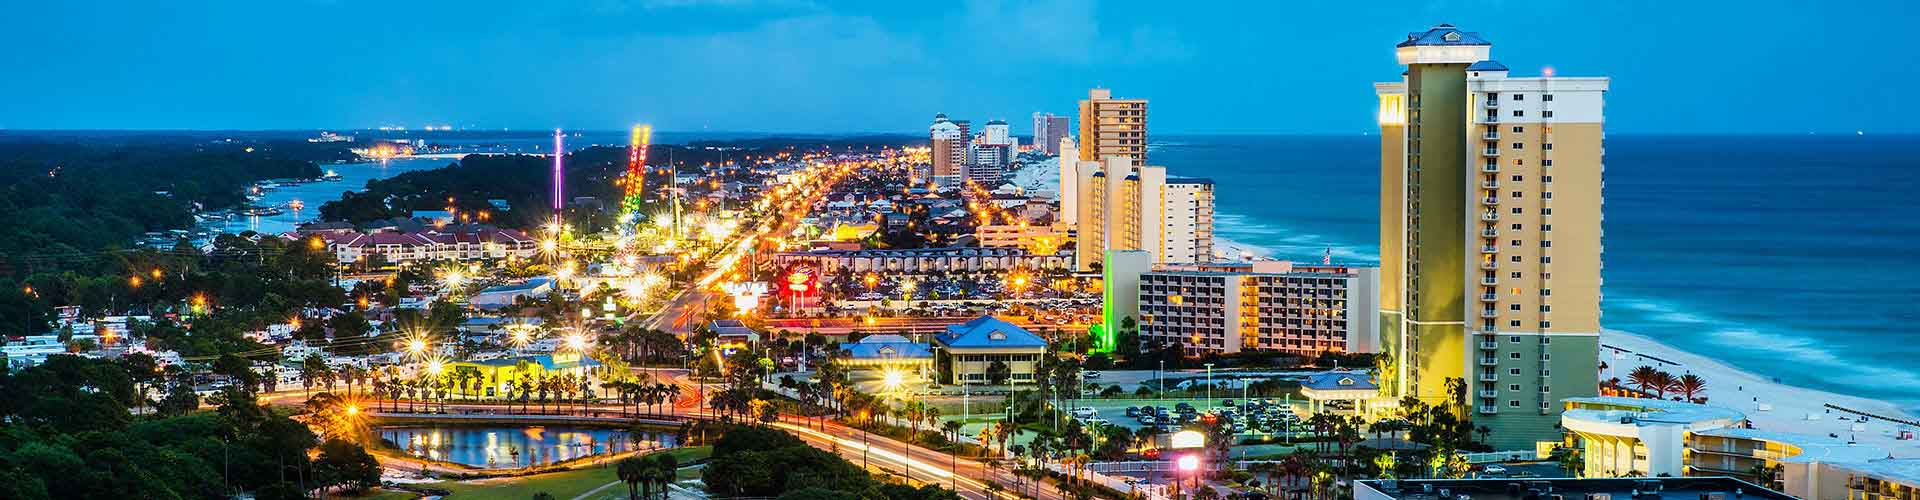 Flamingo Hotel Panama City Beach Florida